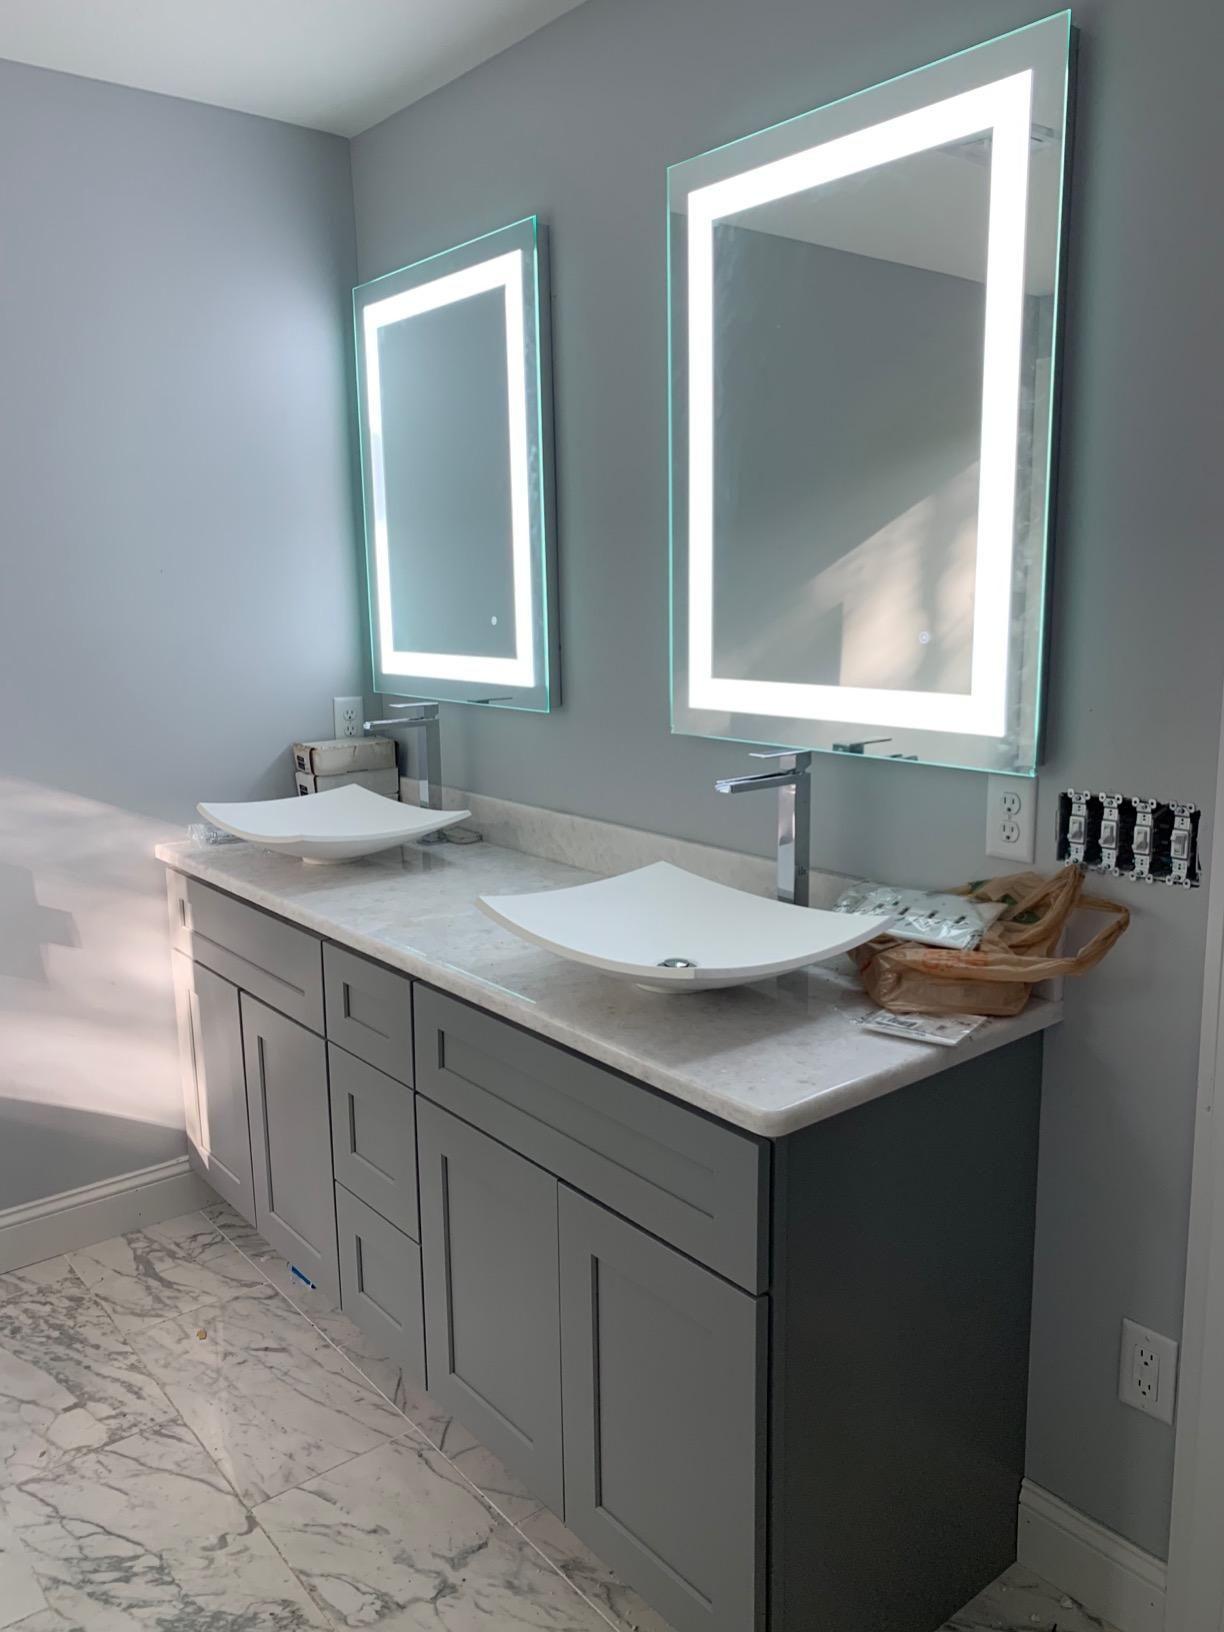 Vanity Mirror with Led Lights | Led mirror bathroom ...